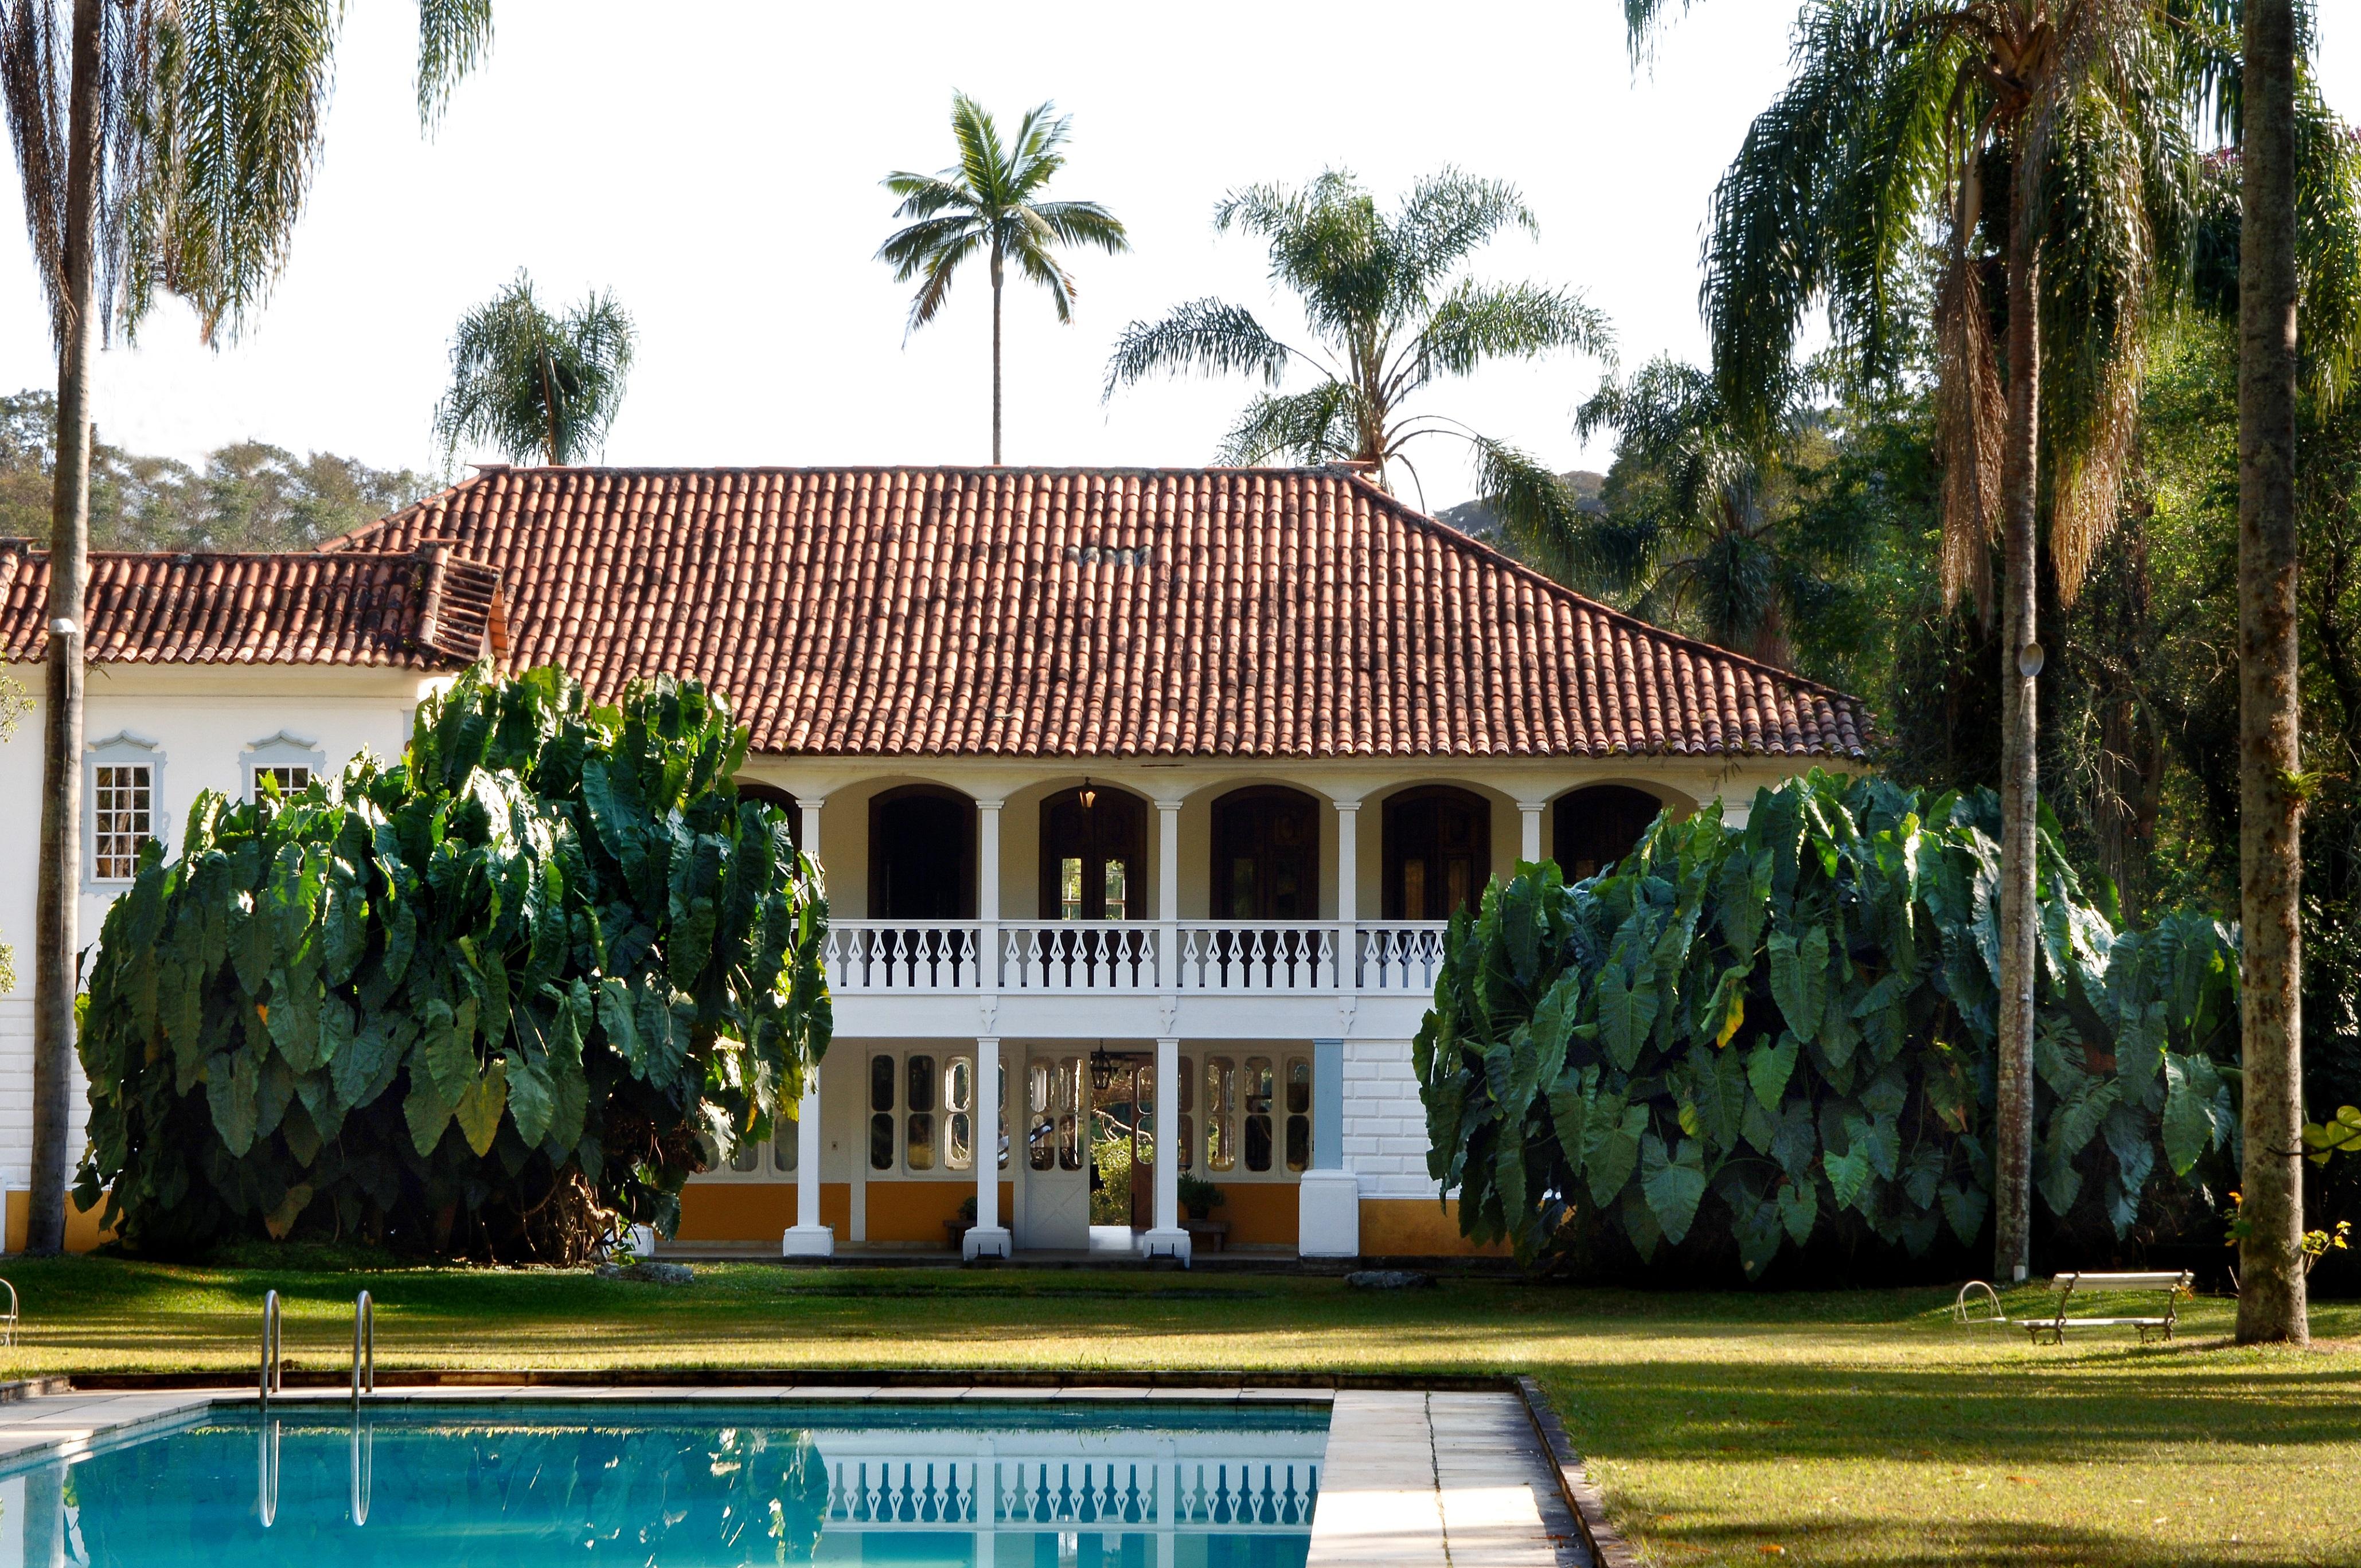 農場 / 牧場 / 種植場 為 出售 在 Saint Antonio farm Estrada Philuvio Cerqueira Rodrigues Itaipava, 里約熱內盧, 25745070 巴西